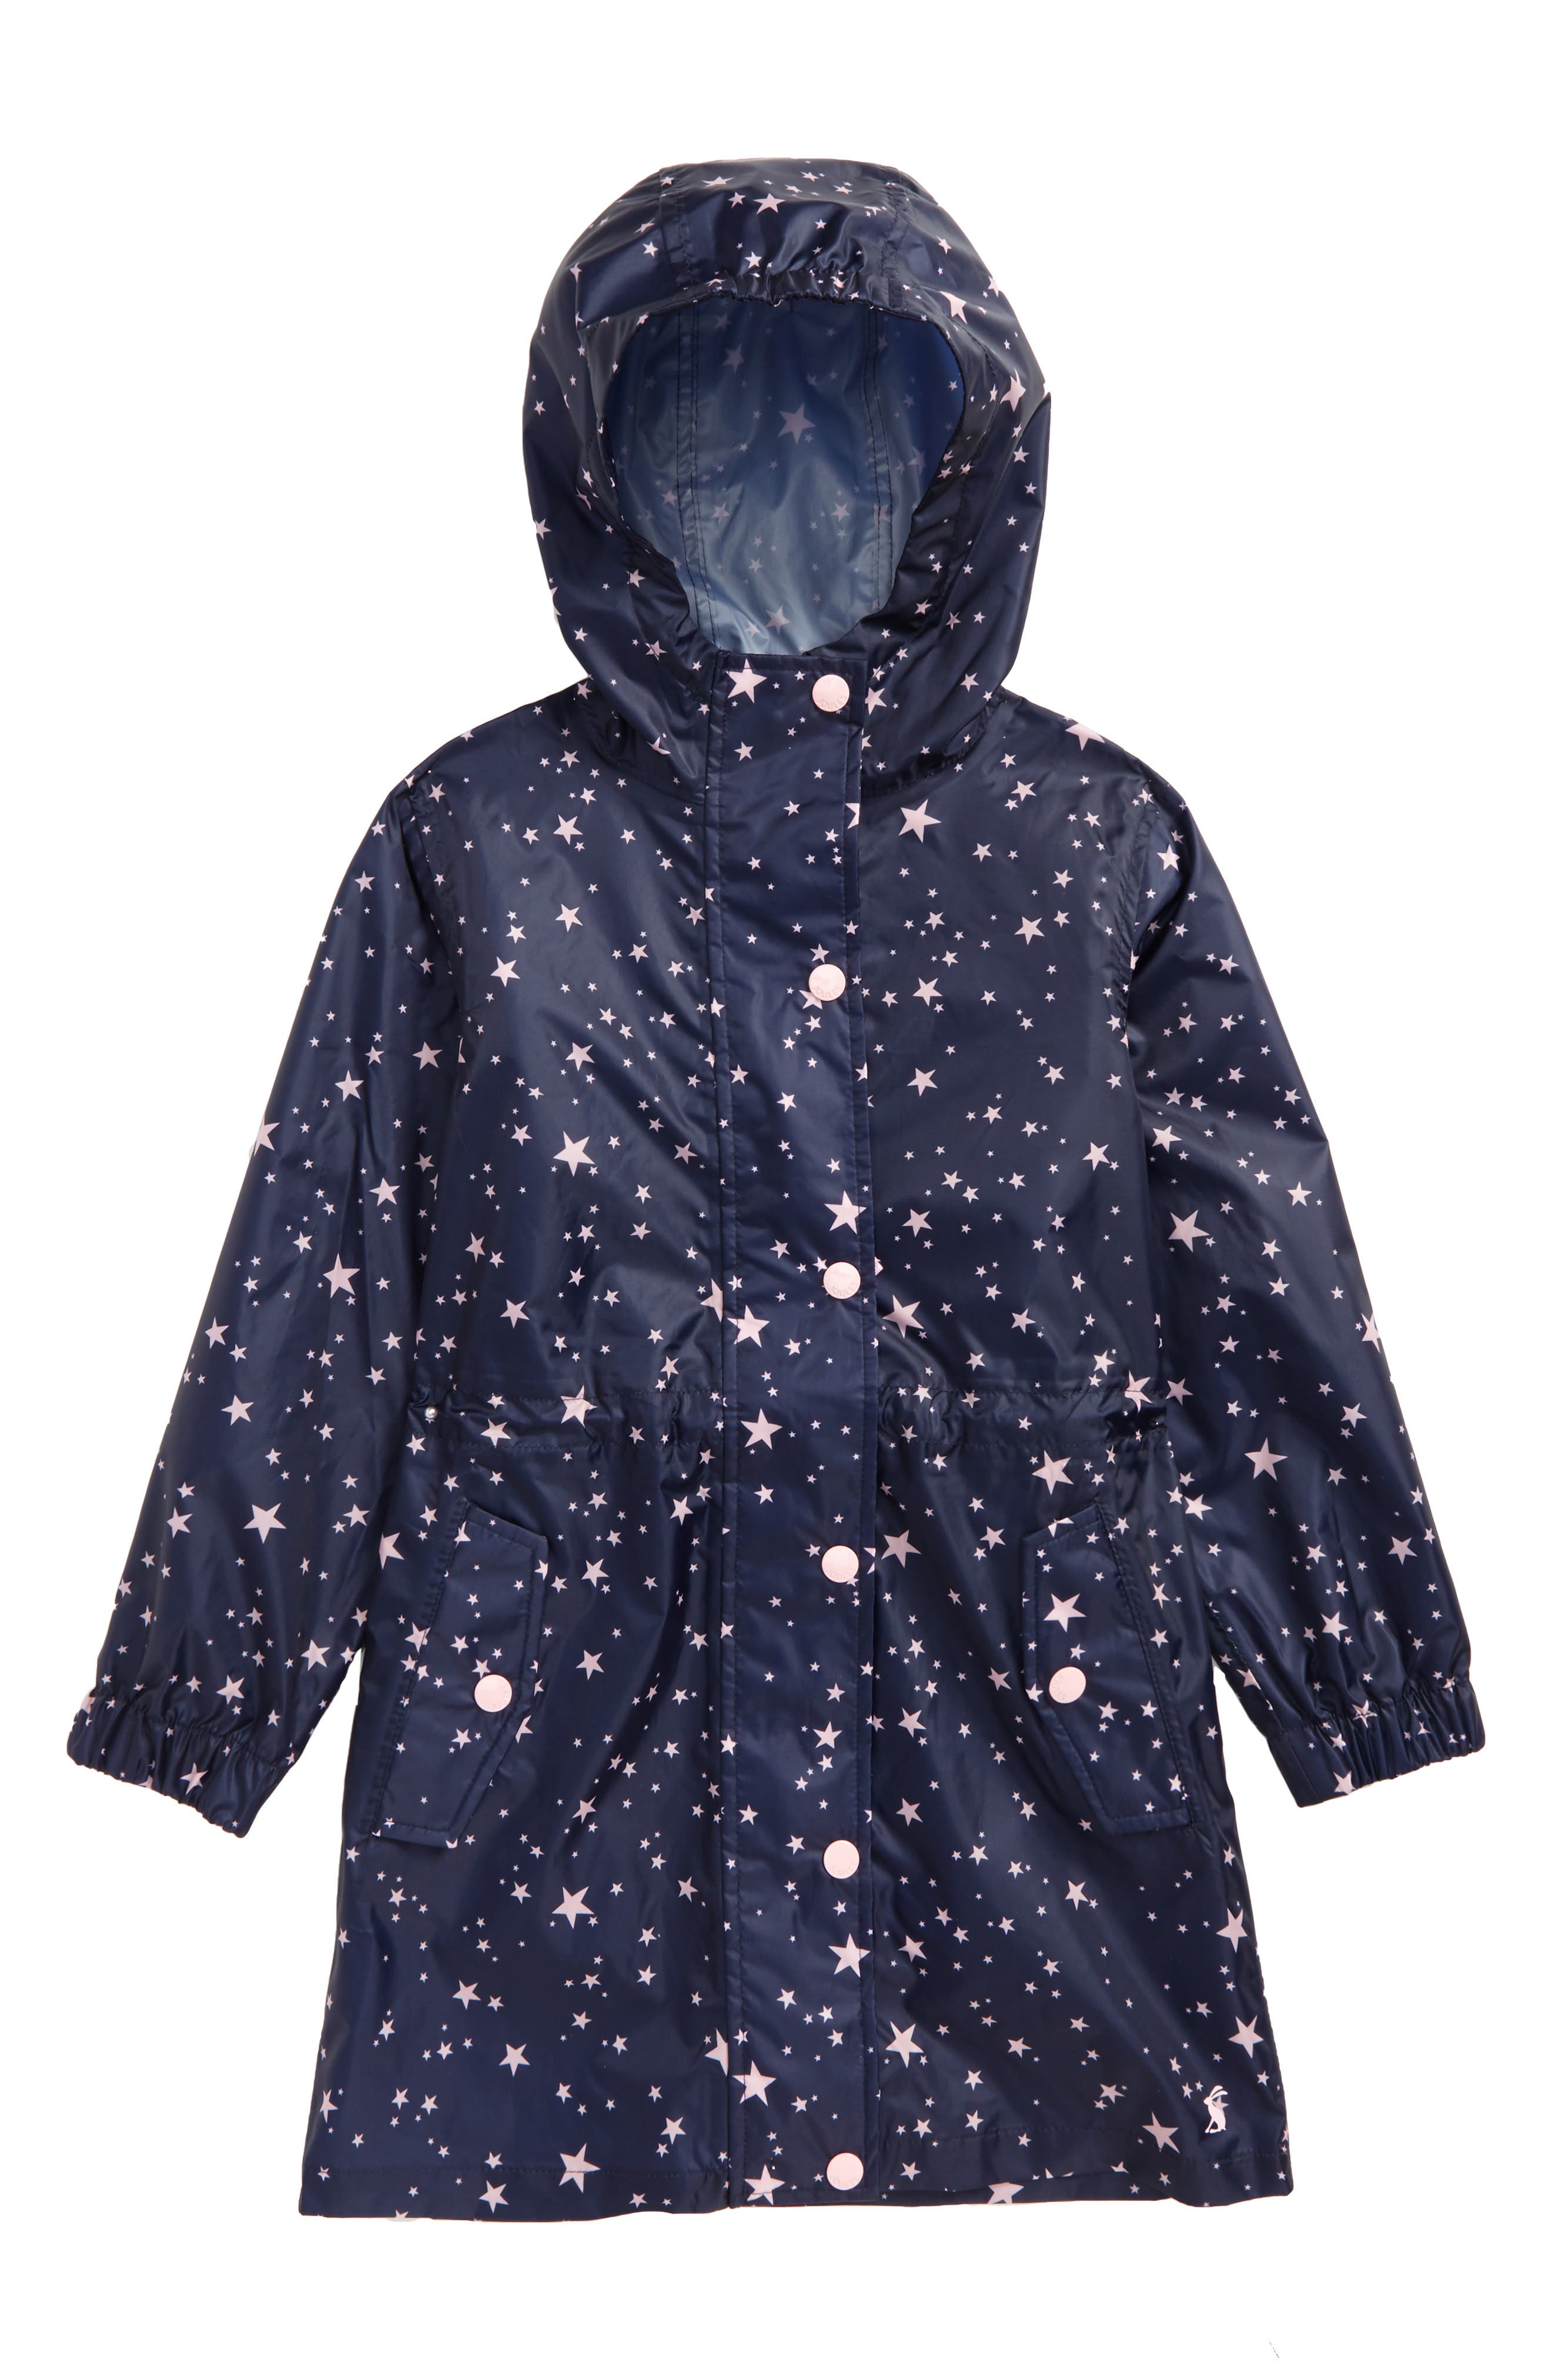 Print Packaway Rain Coat,                             Main thumbnail 1, color,                             Star